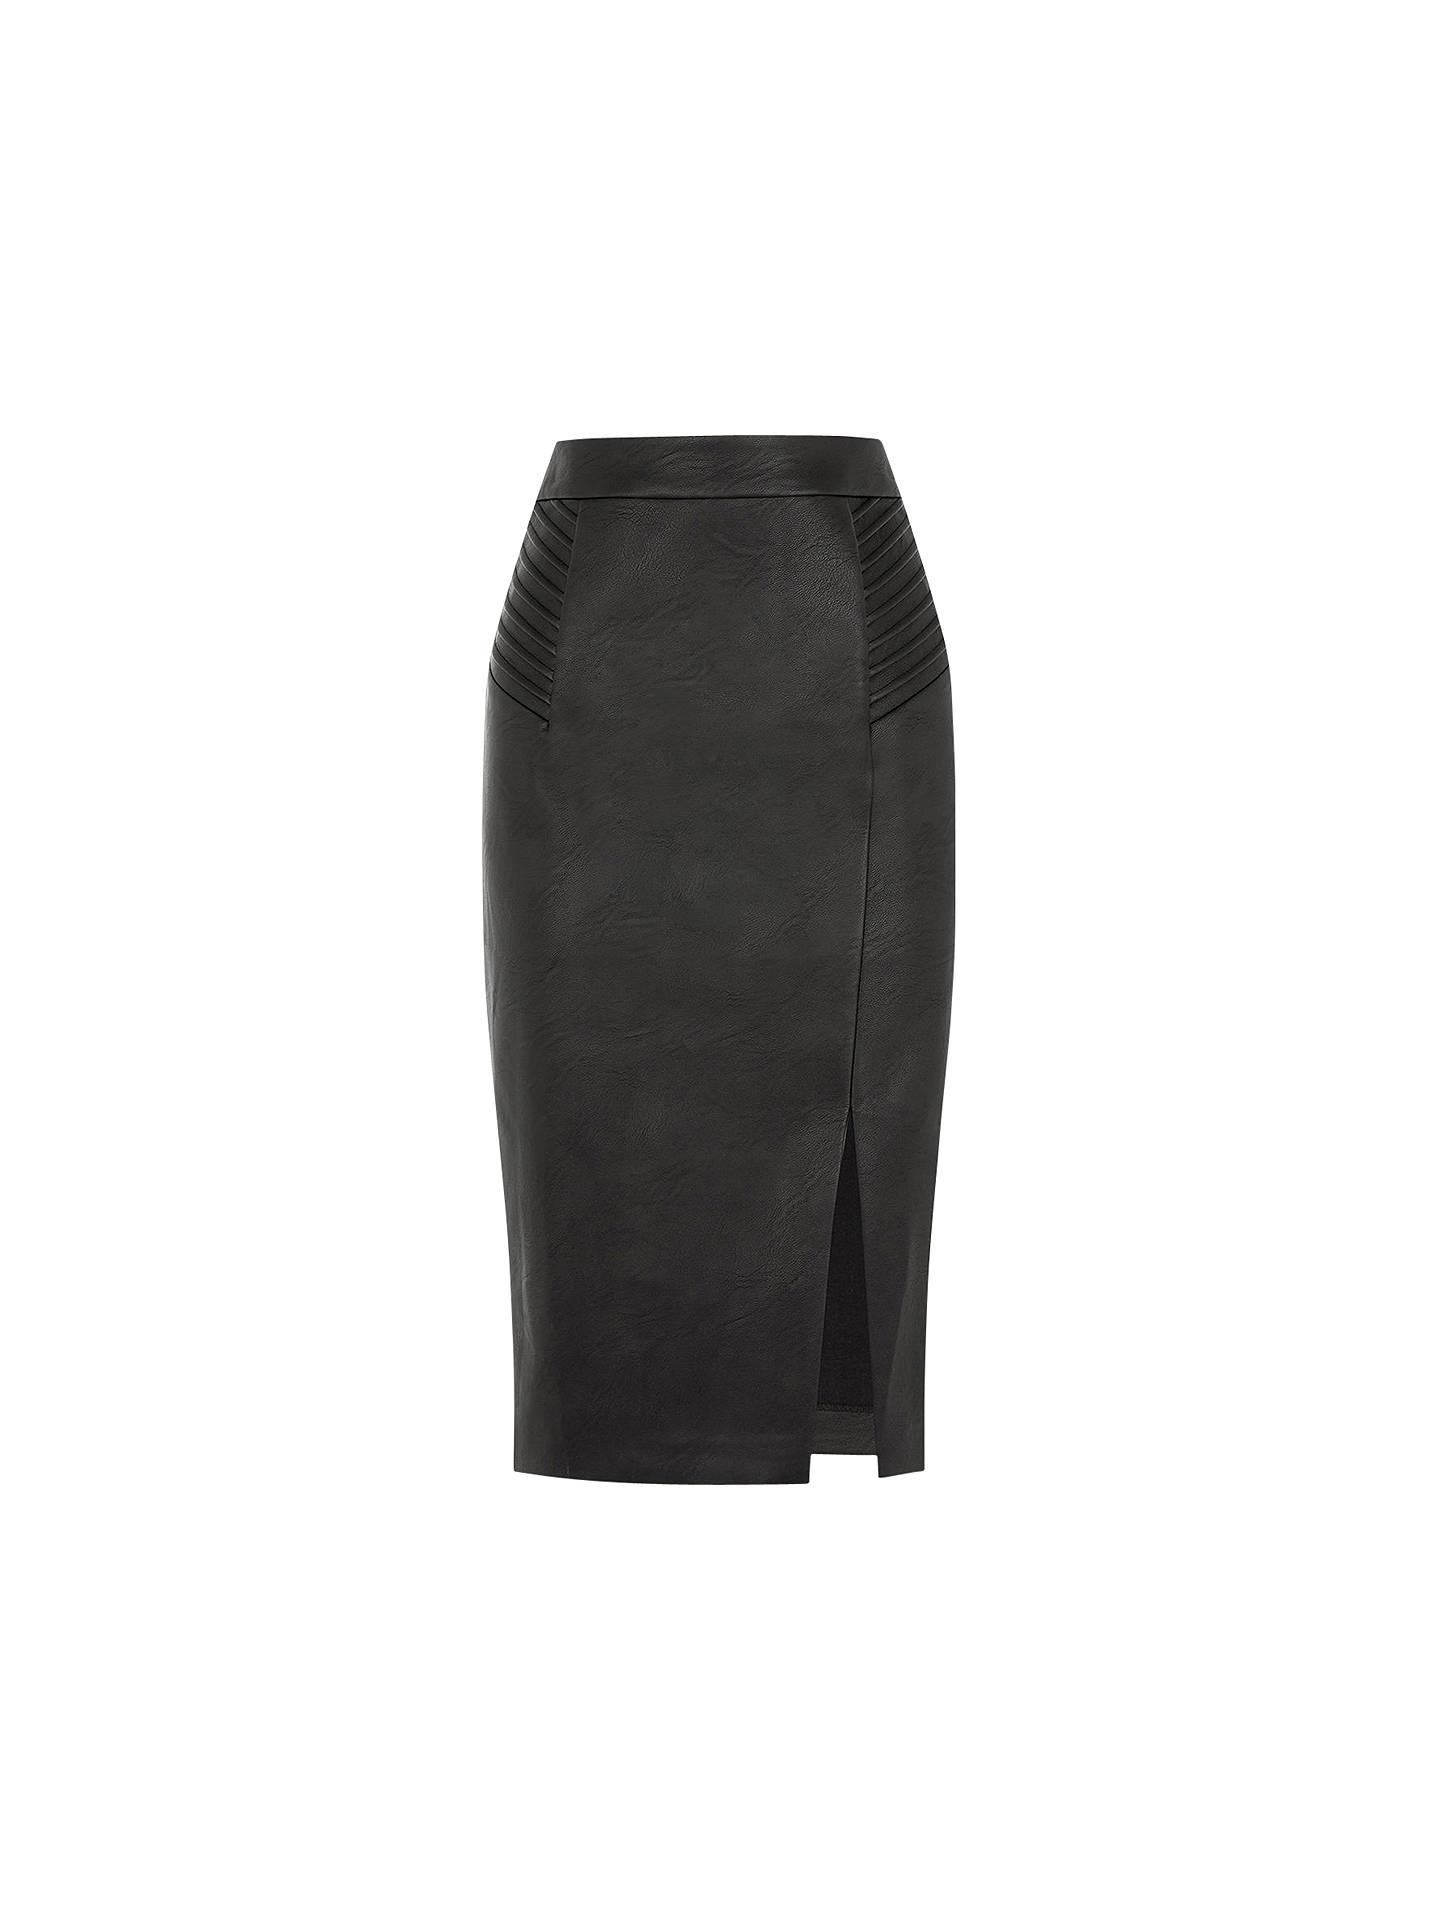 63022a7ec BuyOasis Pintuck Wrap Pencil Skirt, Black, 8 Online at johnlewis.com ...